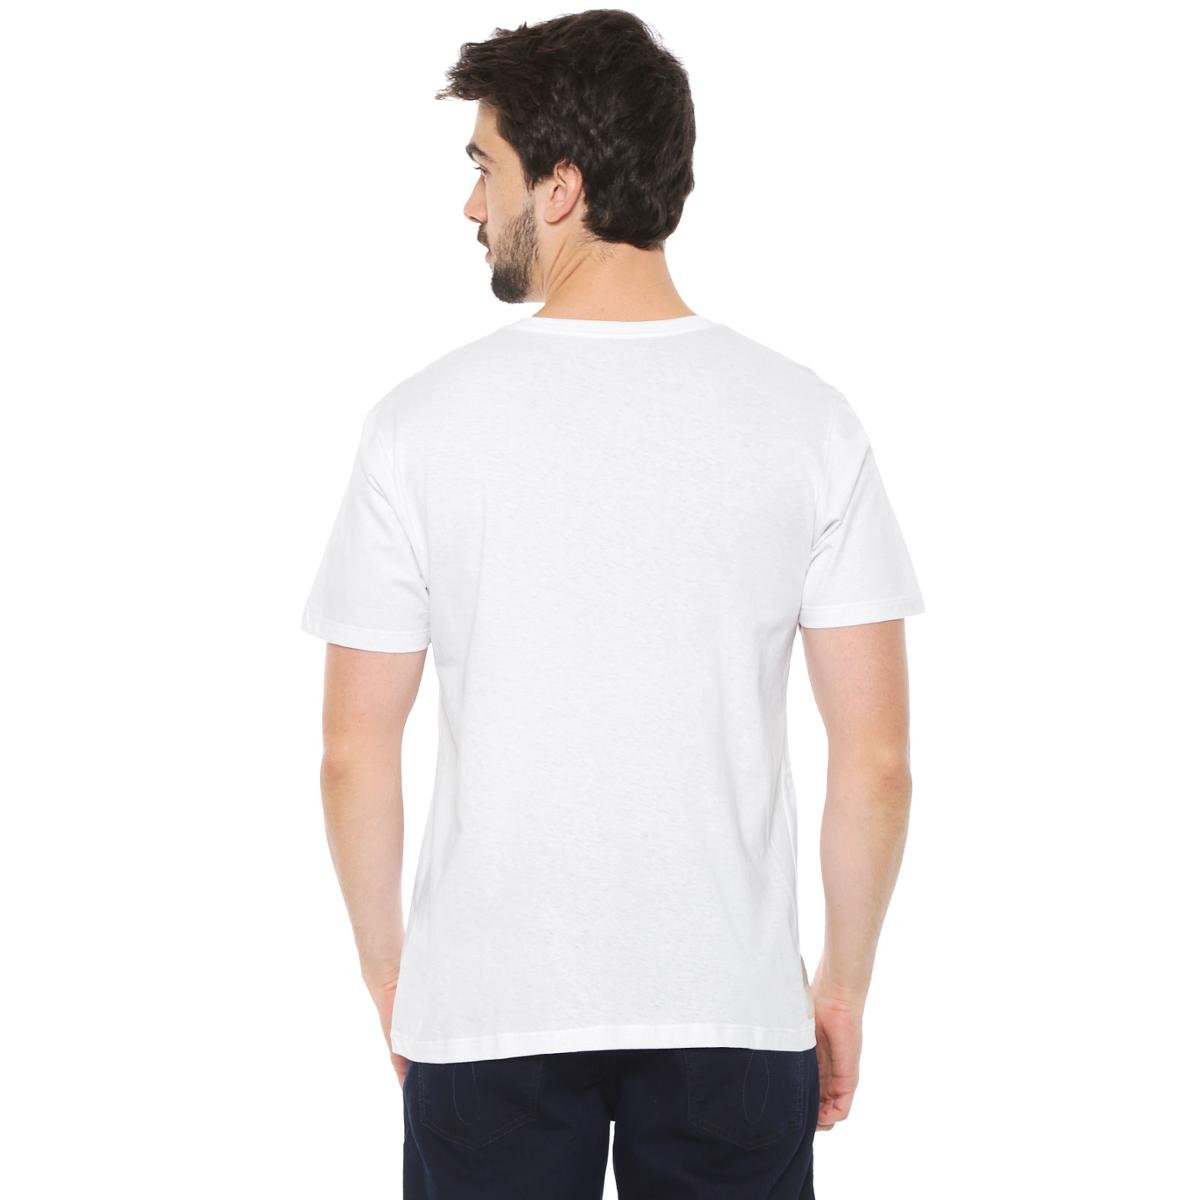 Camiseta Talismã Store Eco Canyon No Signal Masculina - Branco